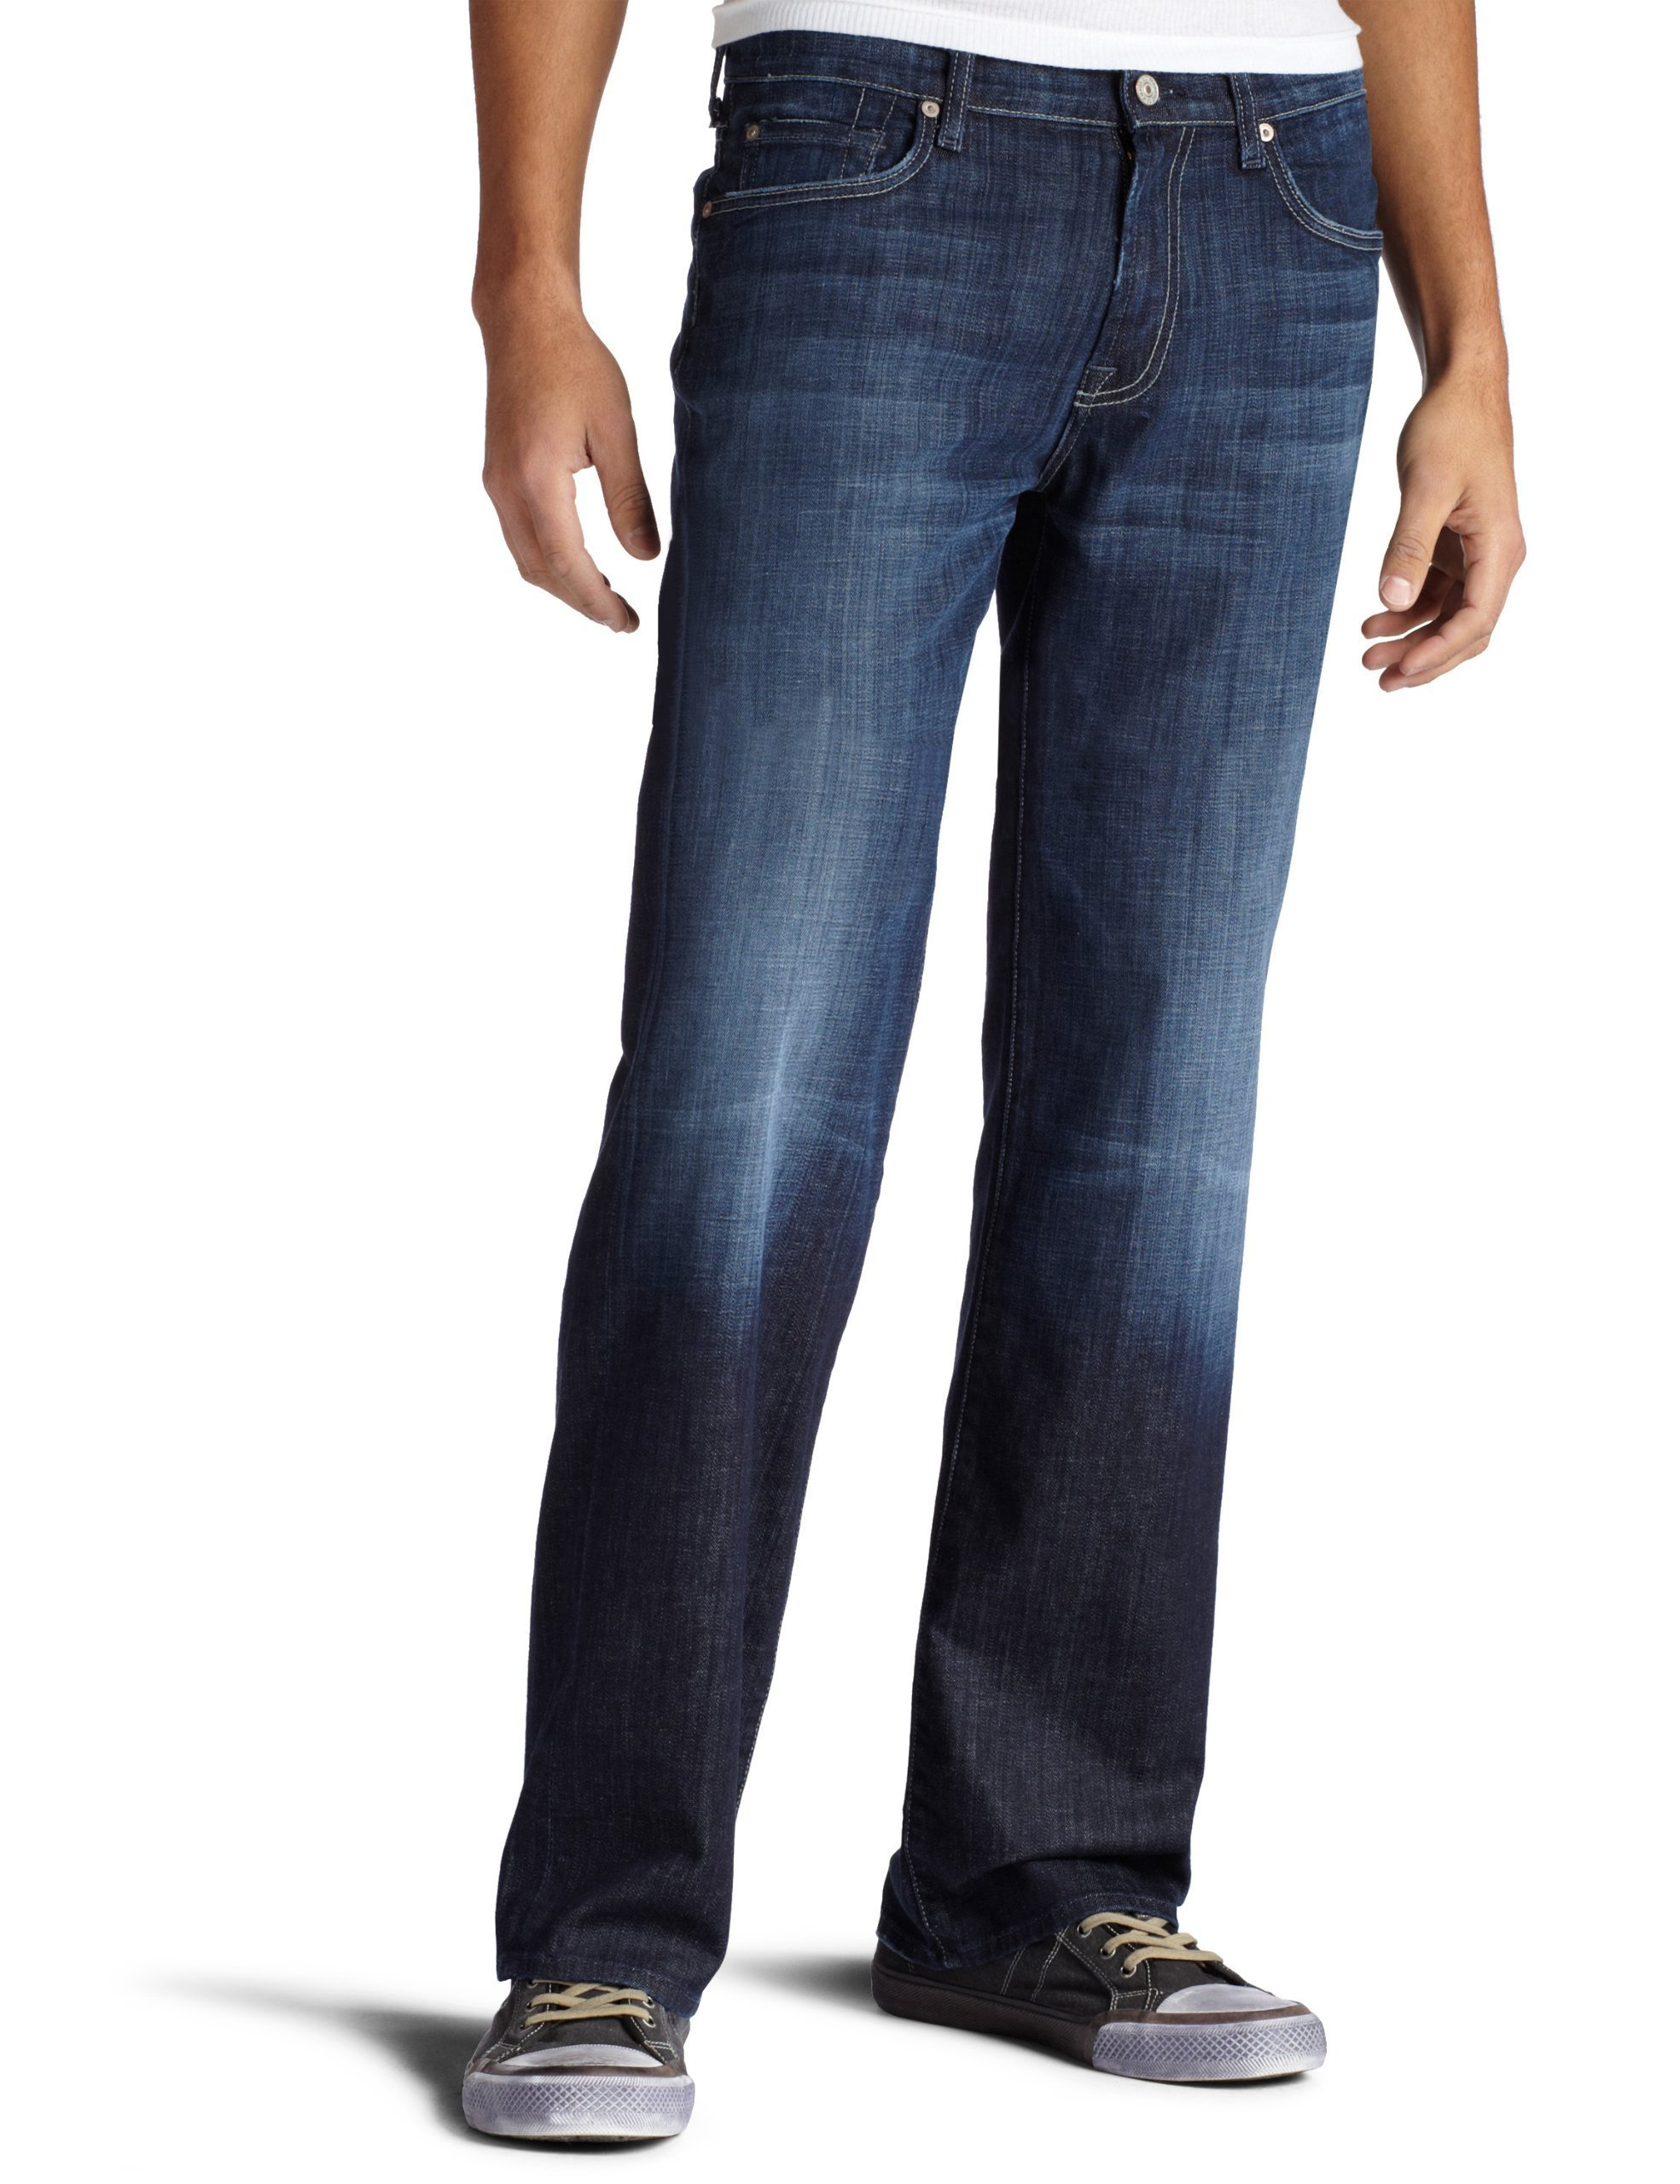 7 For All Mankind Men's Austyn Relaxed Straight-Leg Jean in Los Angeles Dark, Los Angeles Dark, 32x34